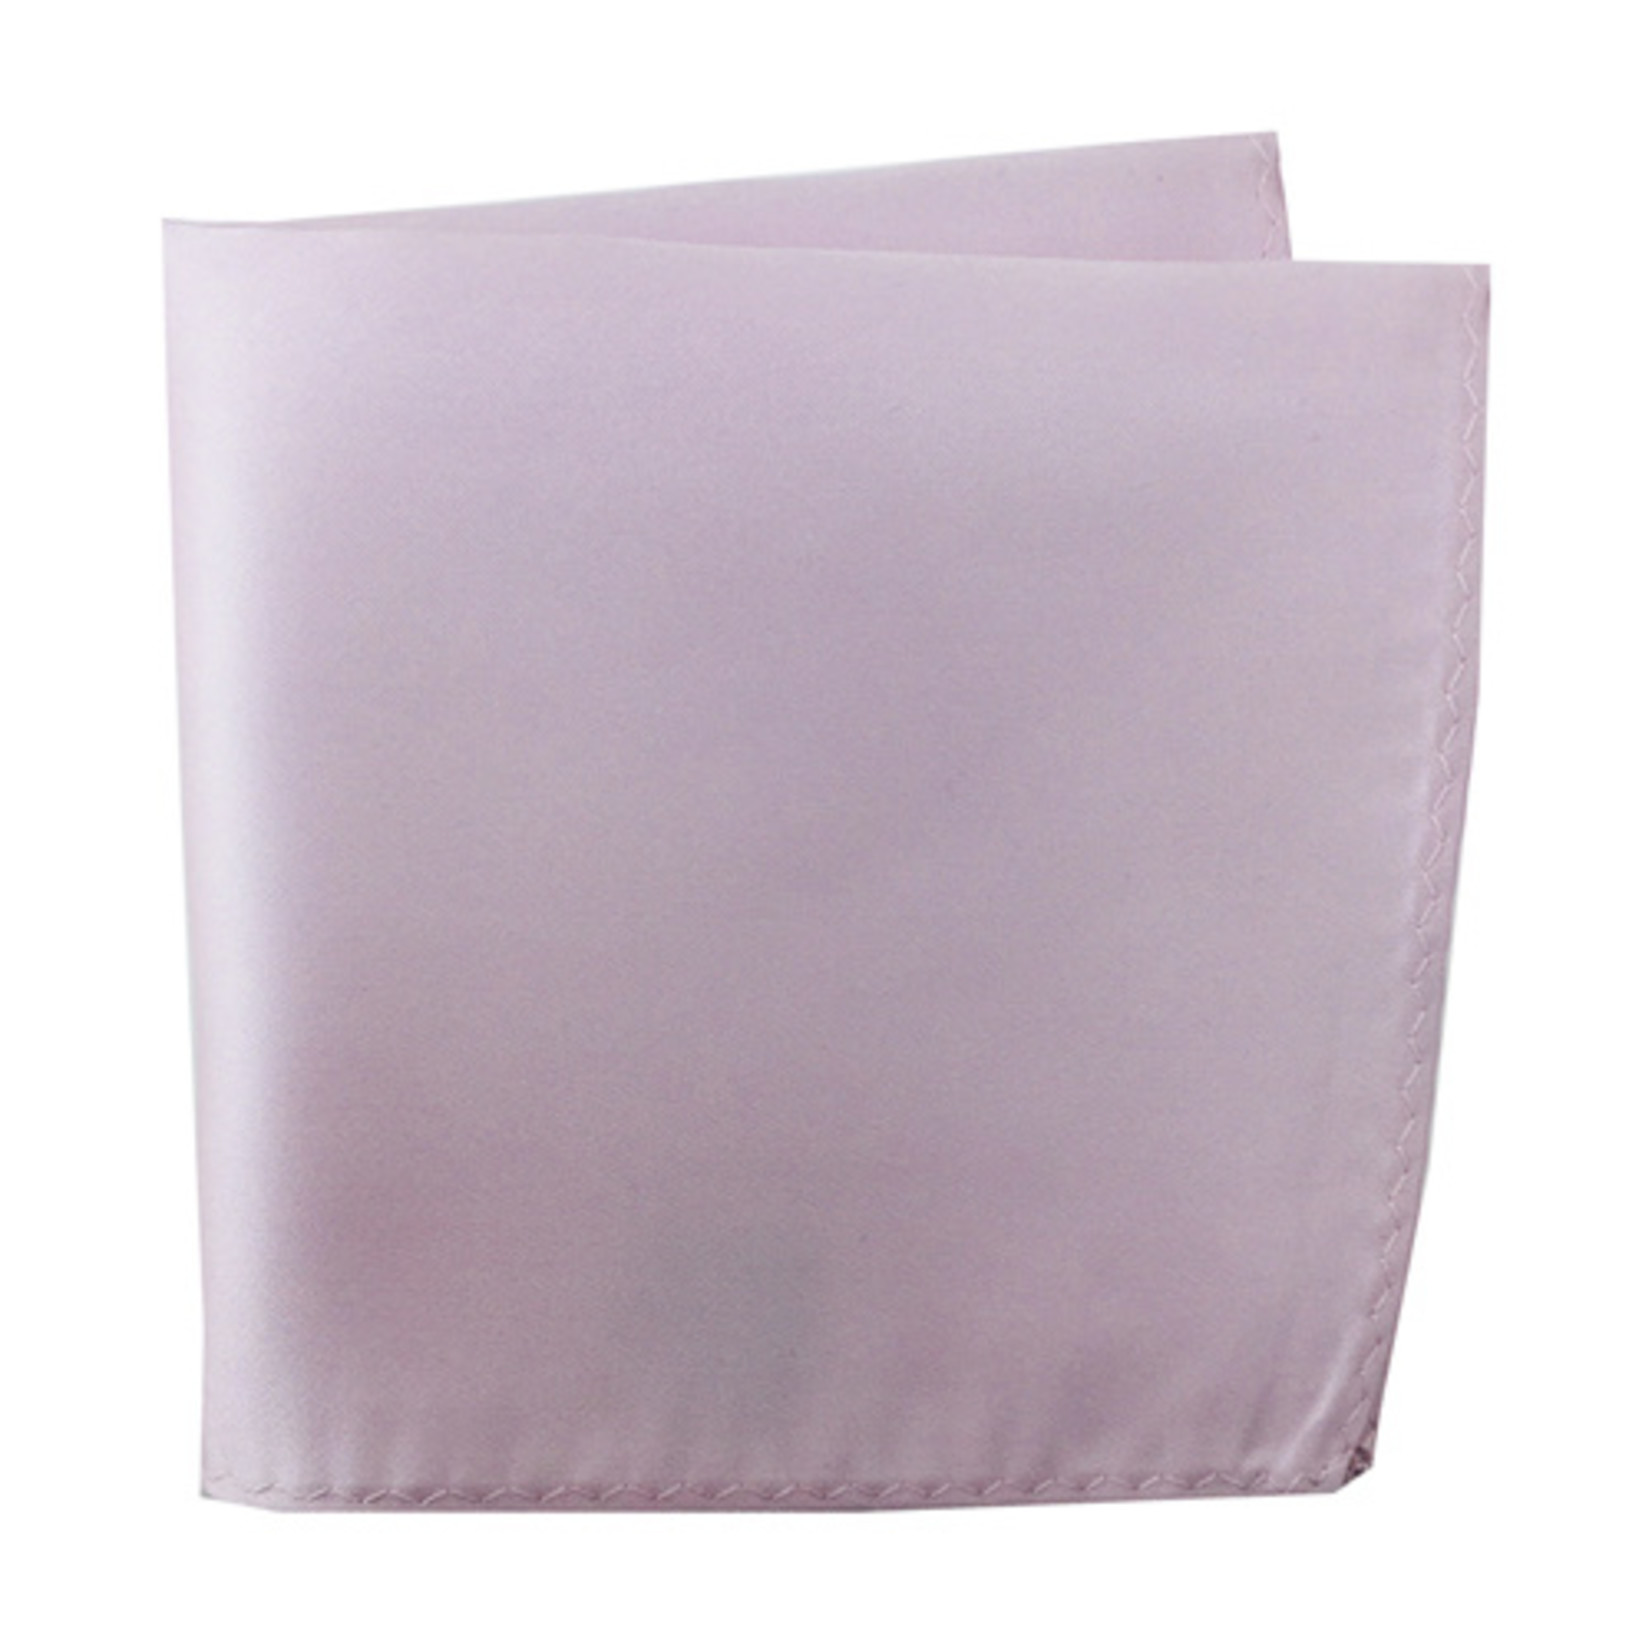 Knotz M100PSQ-55 Solid Blush Pink Pocket Square